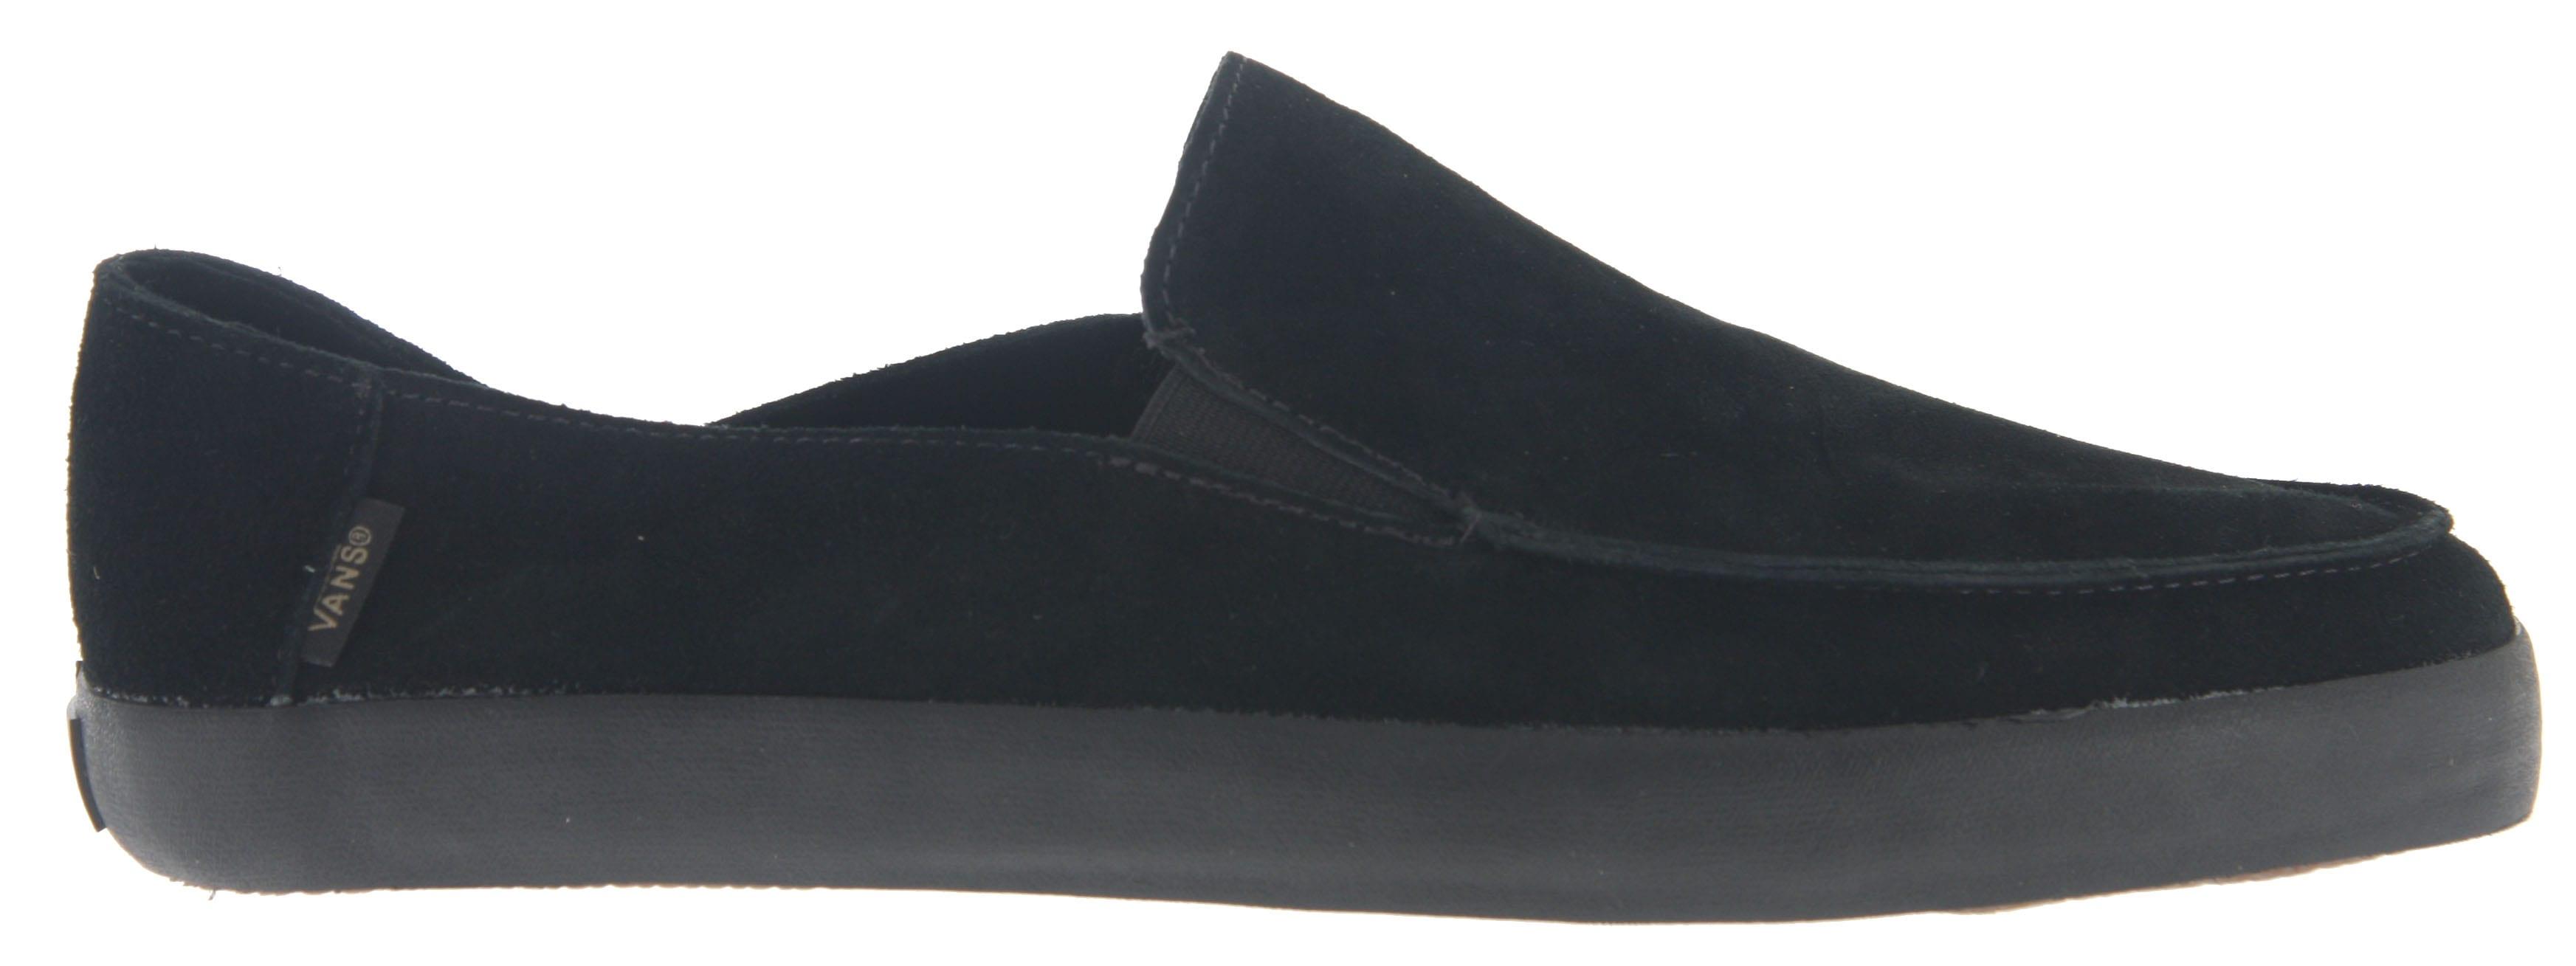 1885237918a988 Vans Bali Shoes - thumbnail 1